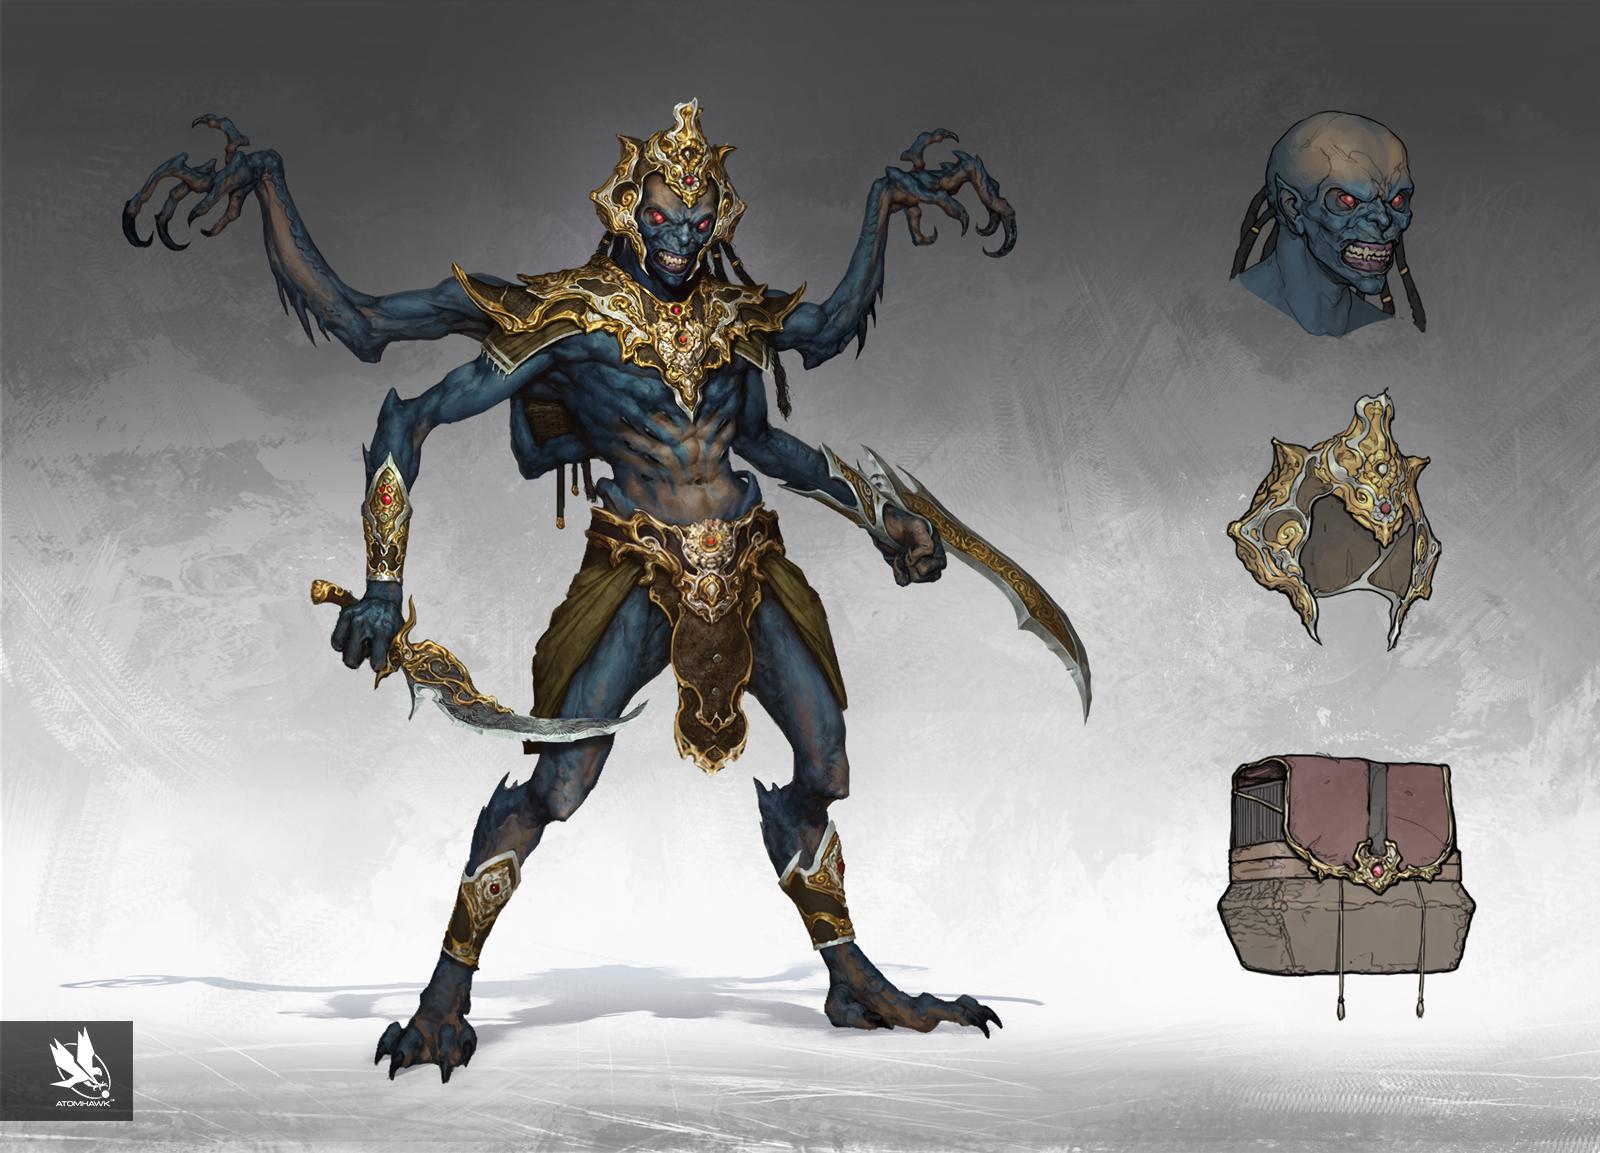 Atomhawk_Warner-Bros-NetherRealm_Mortal-Kombat-11_Concept-Art_Character-Design_Kollector_Past.jpg